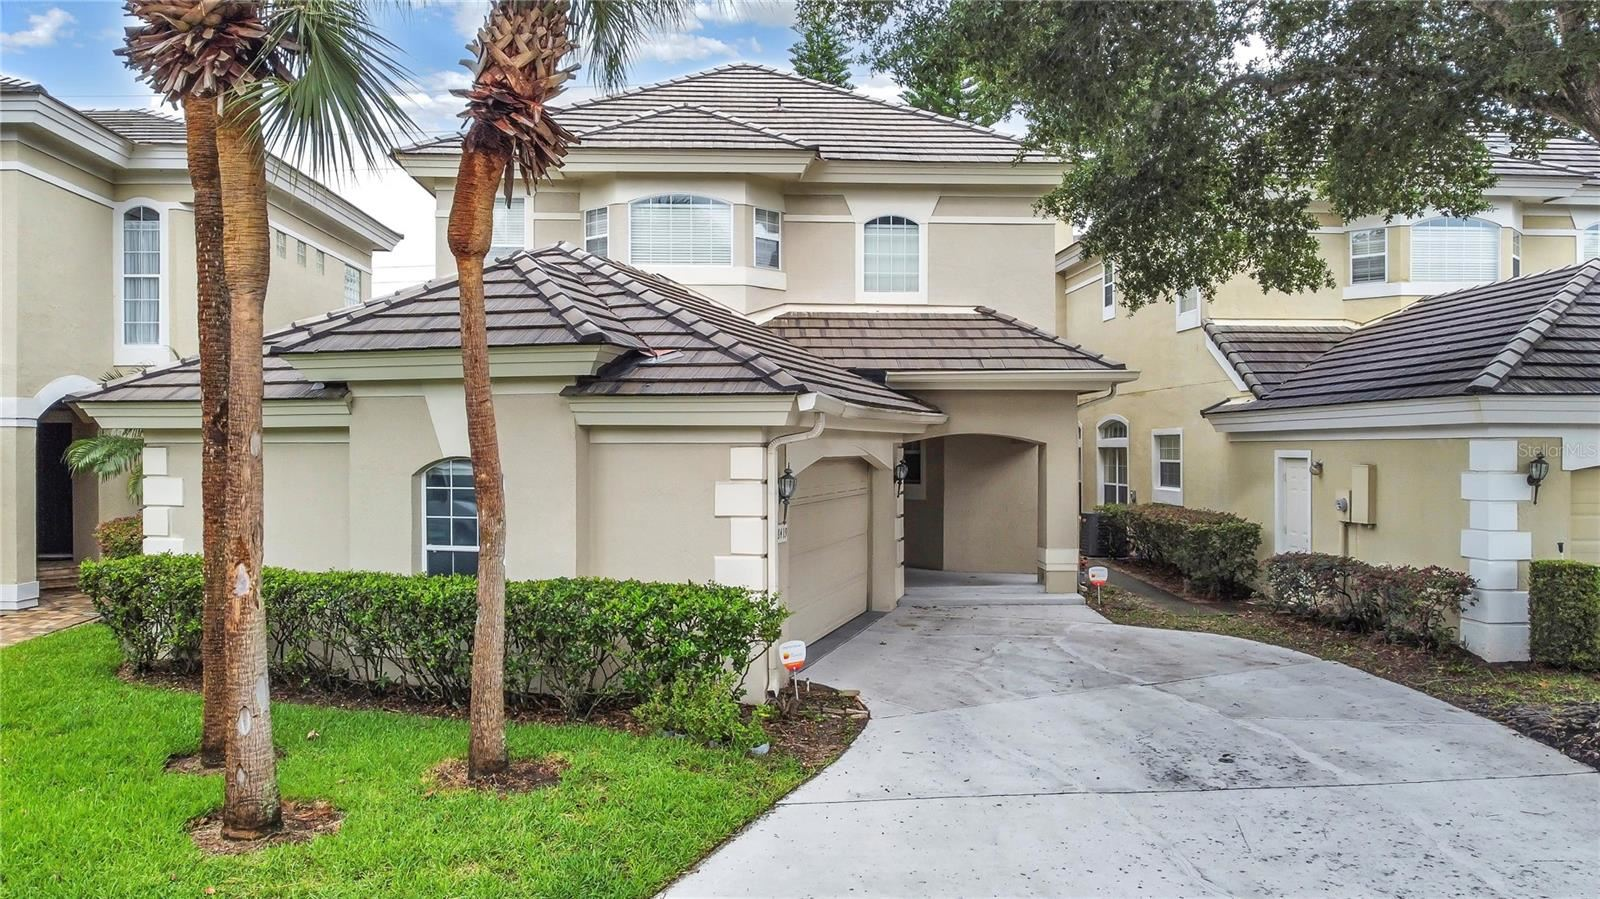 8419 FOXWORTH CIRCLE #12, Orlando, FL 32819 - #: S5052899